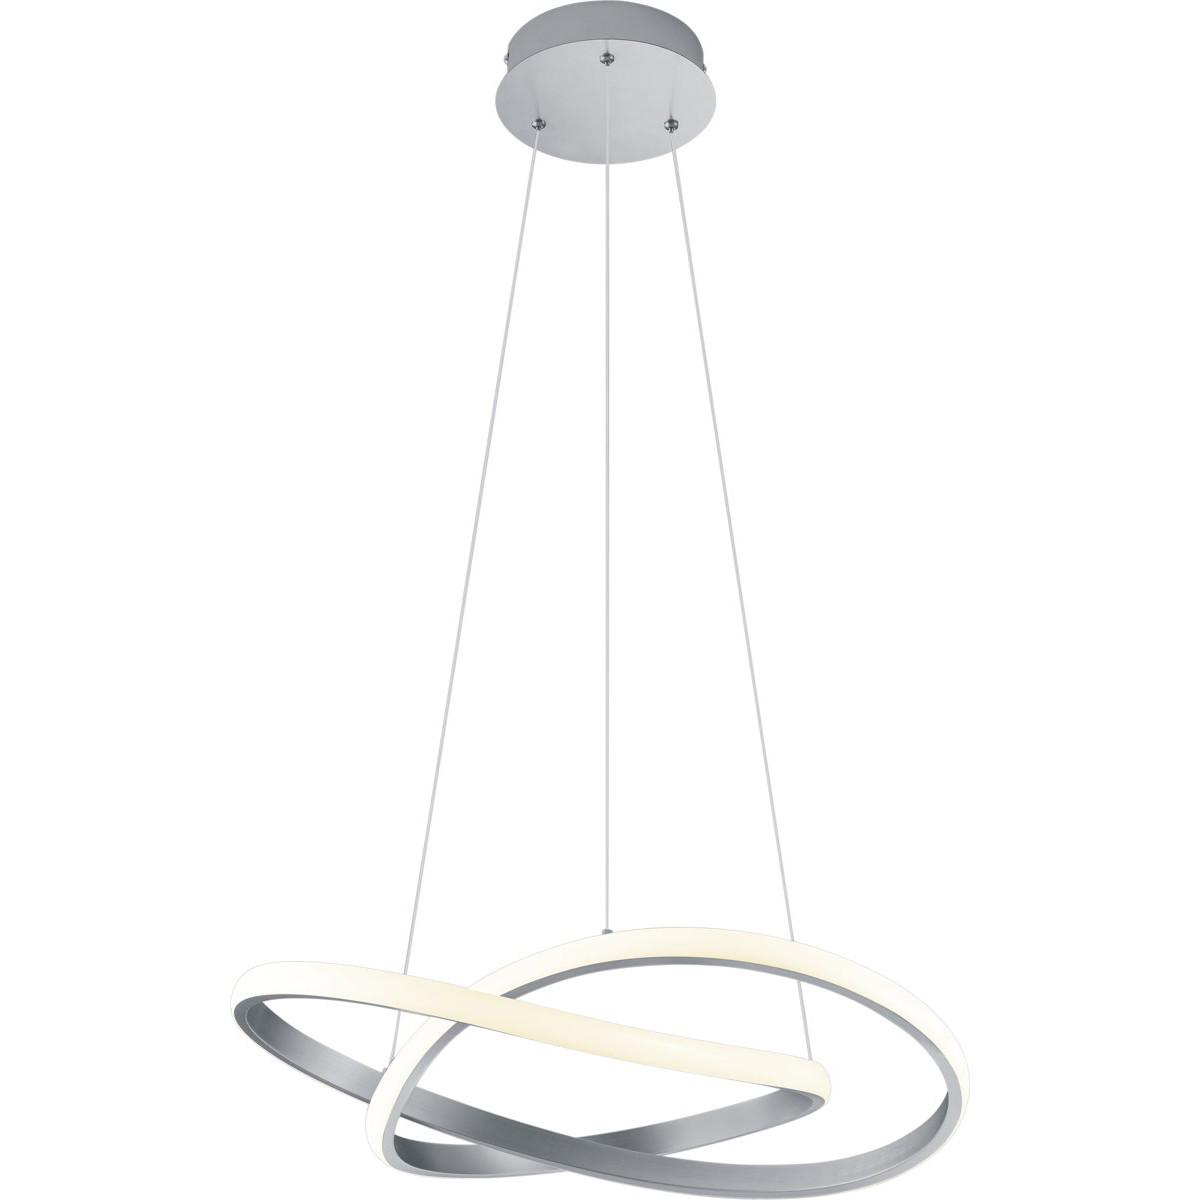 LED Hanglamp - Trion Corcy - 27W - Warm Wit 3000K - Dimbaar - Rond - Mat Nikkel - Aluminium